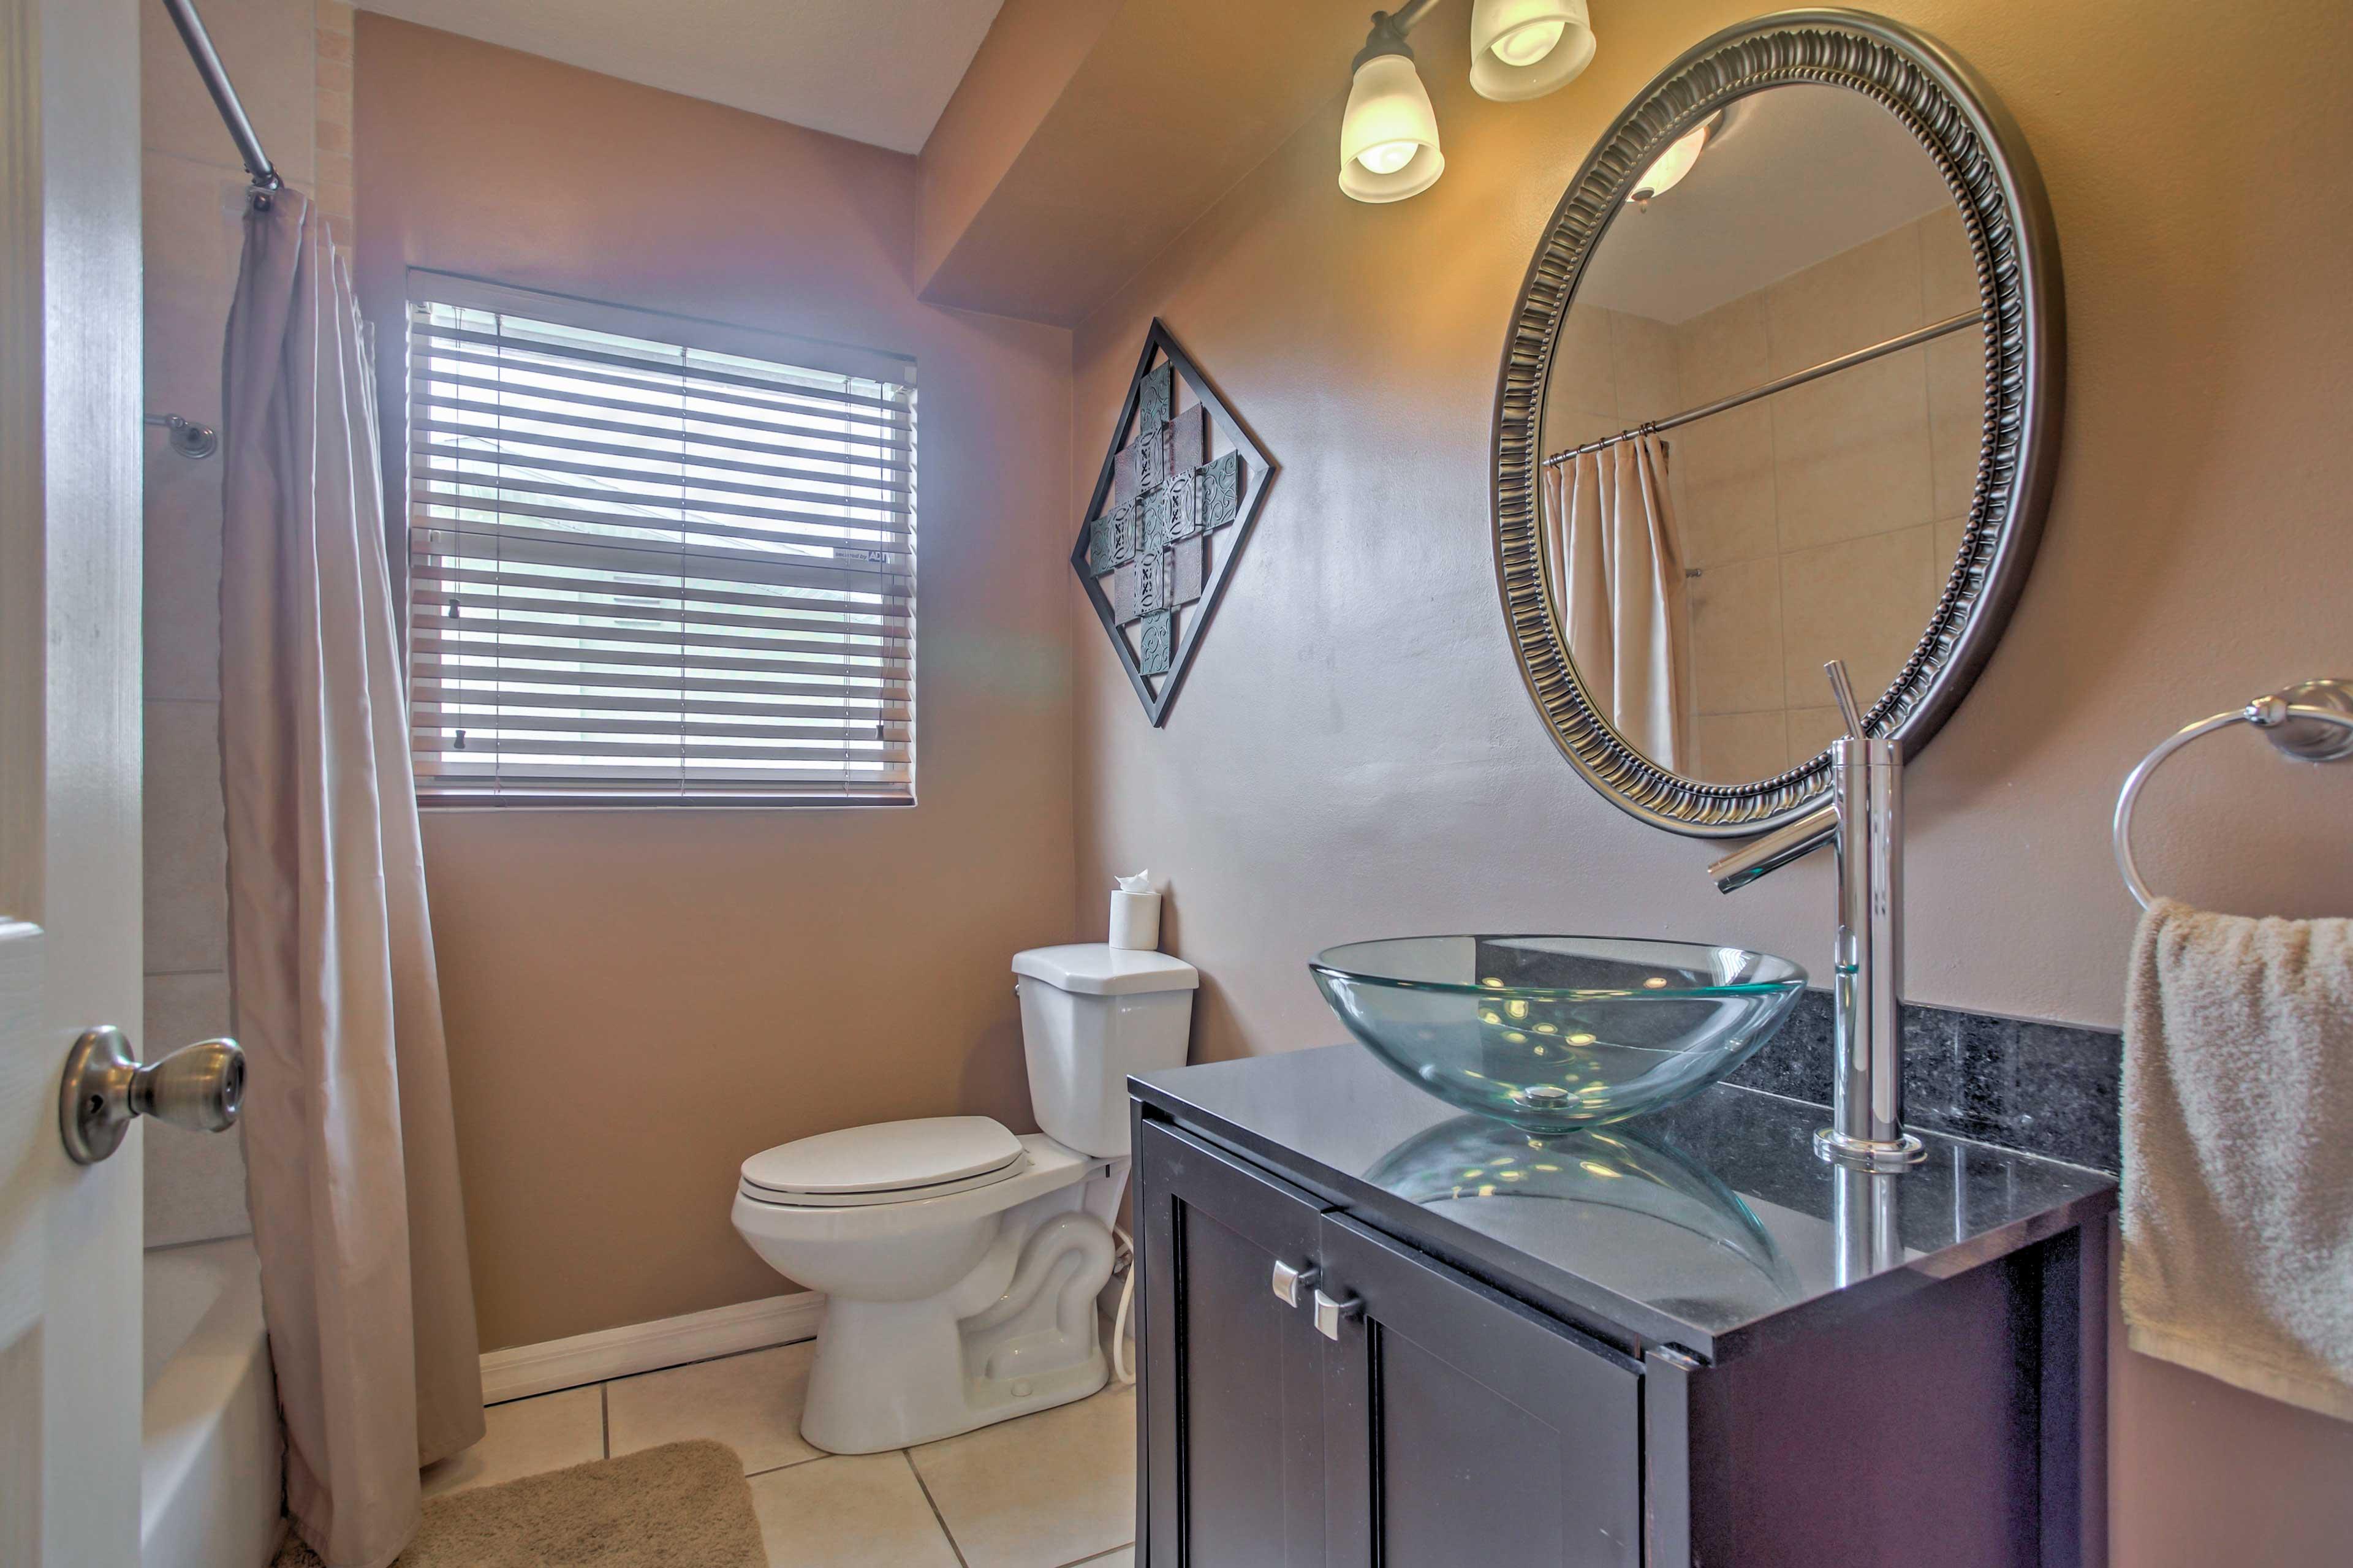 Freshen up in this pristine bathroom!